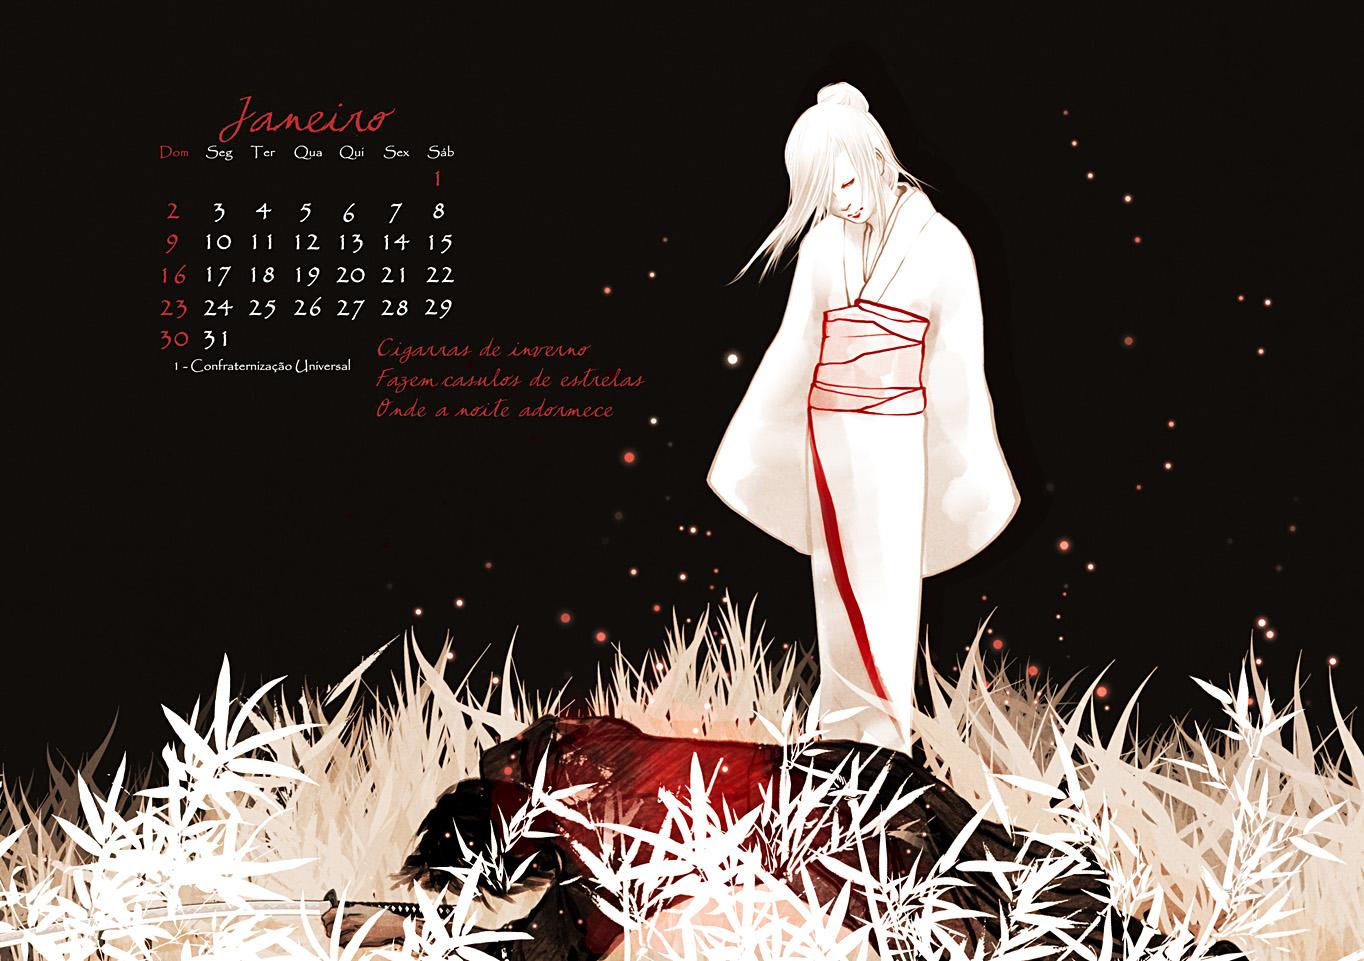 Calendar 2011: January